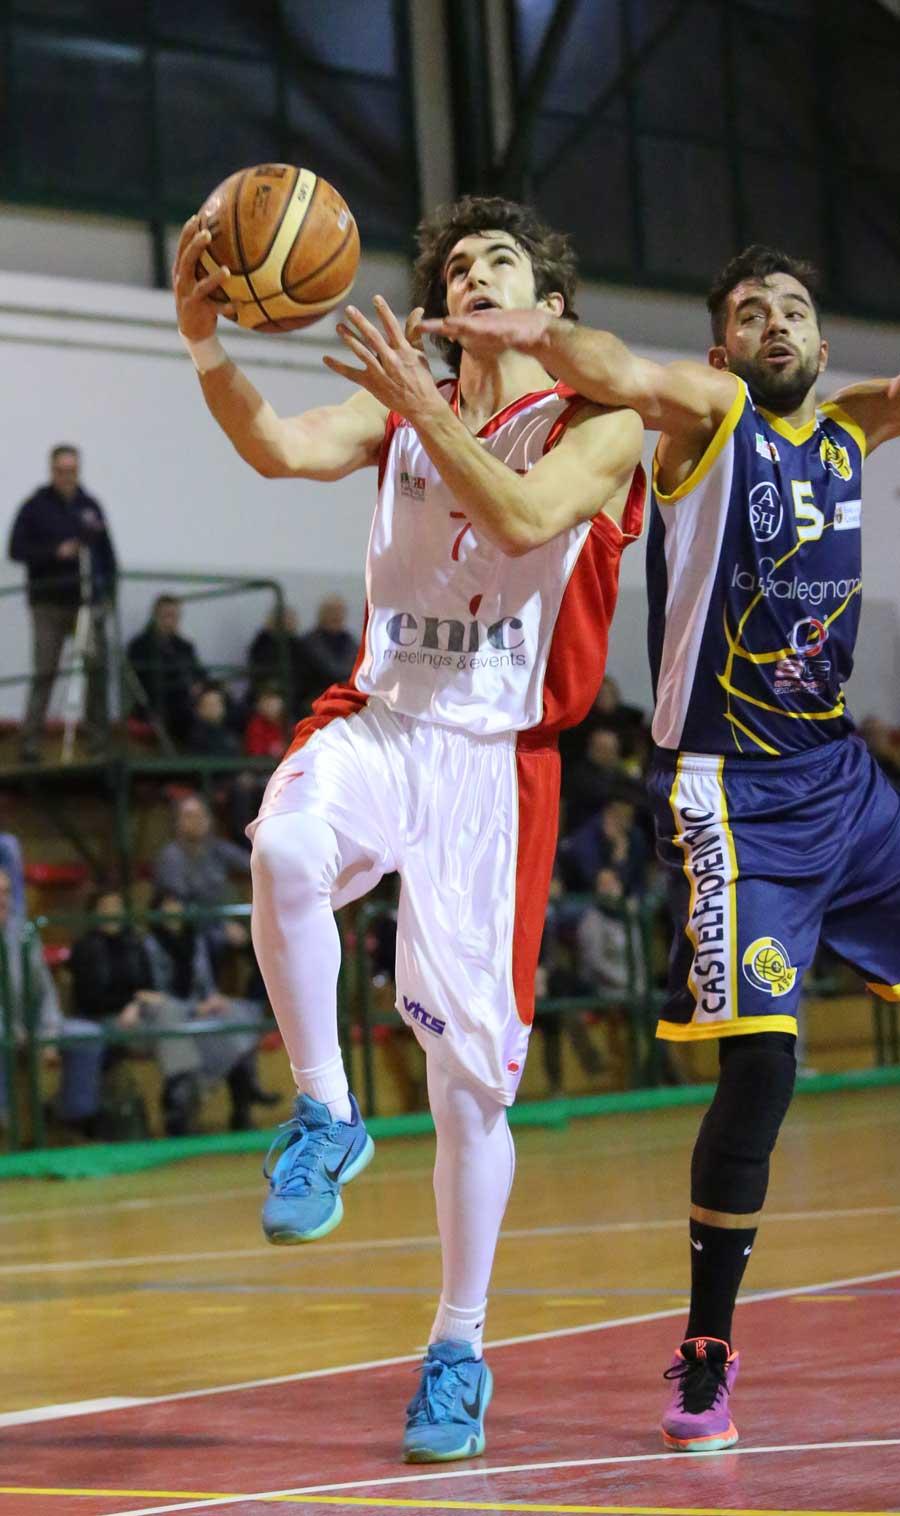 02vieri_marotta_enic_pinodragons_castelfiorentino_basket2016